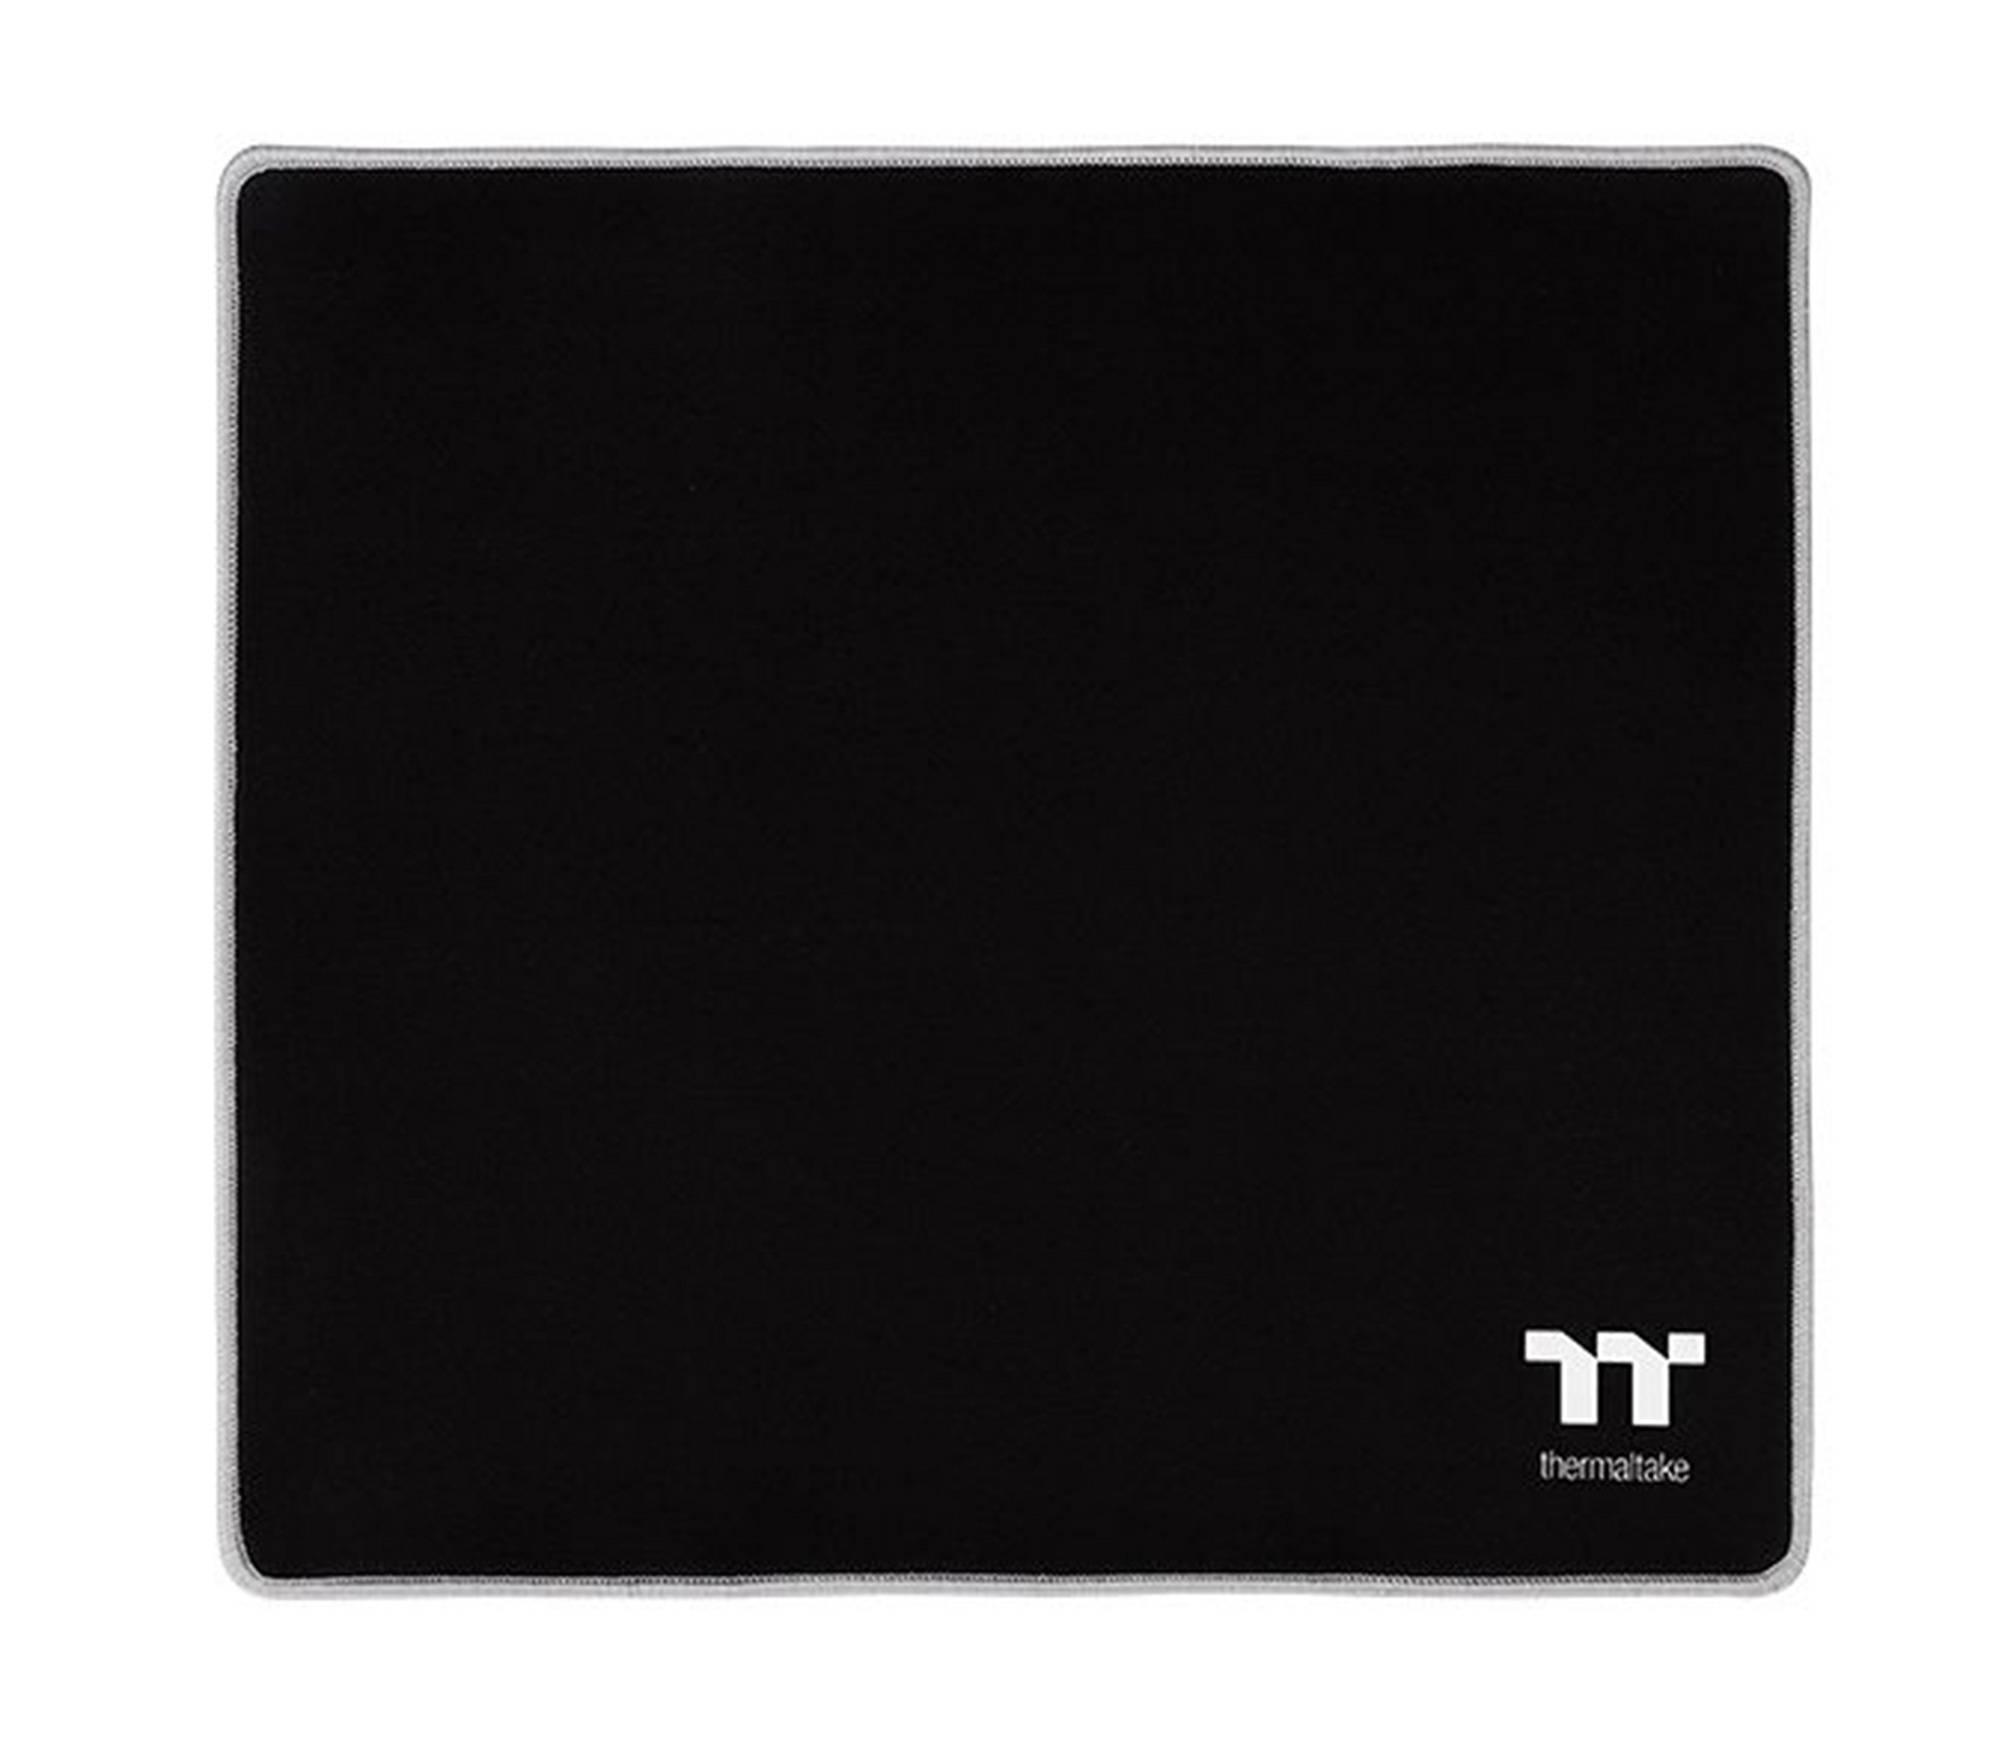 Коврик для мыши Thermaltake M300 черный (GMP-TTP-BLKSMS-01) - фото 1